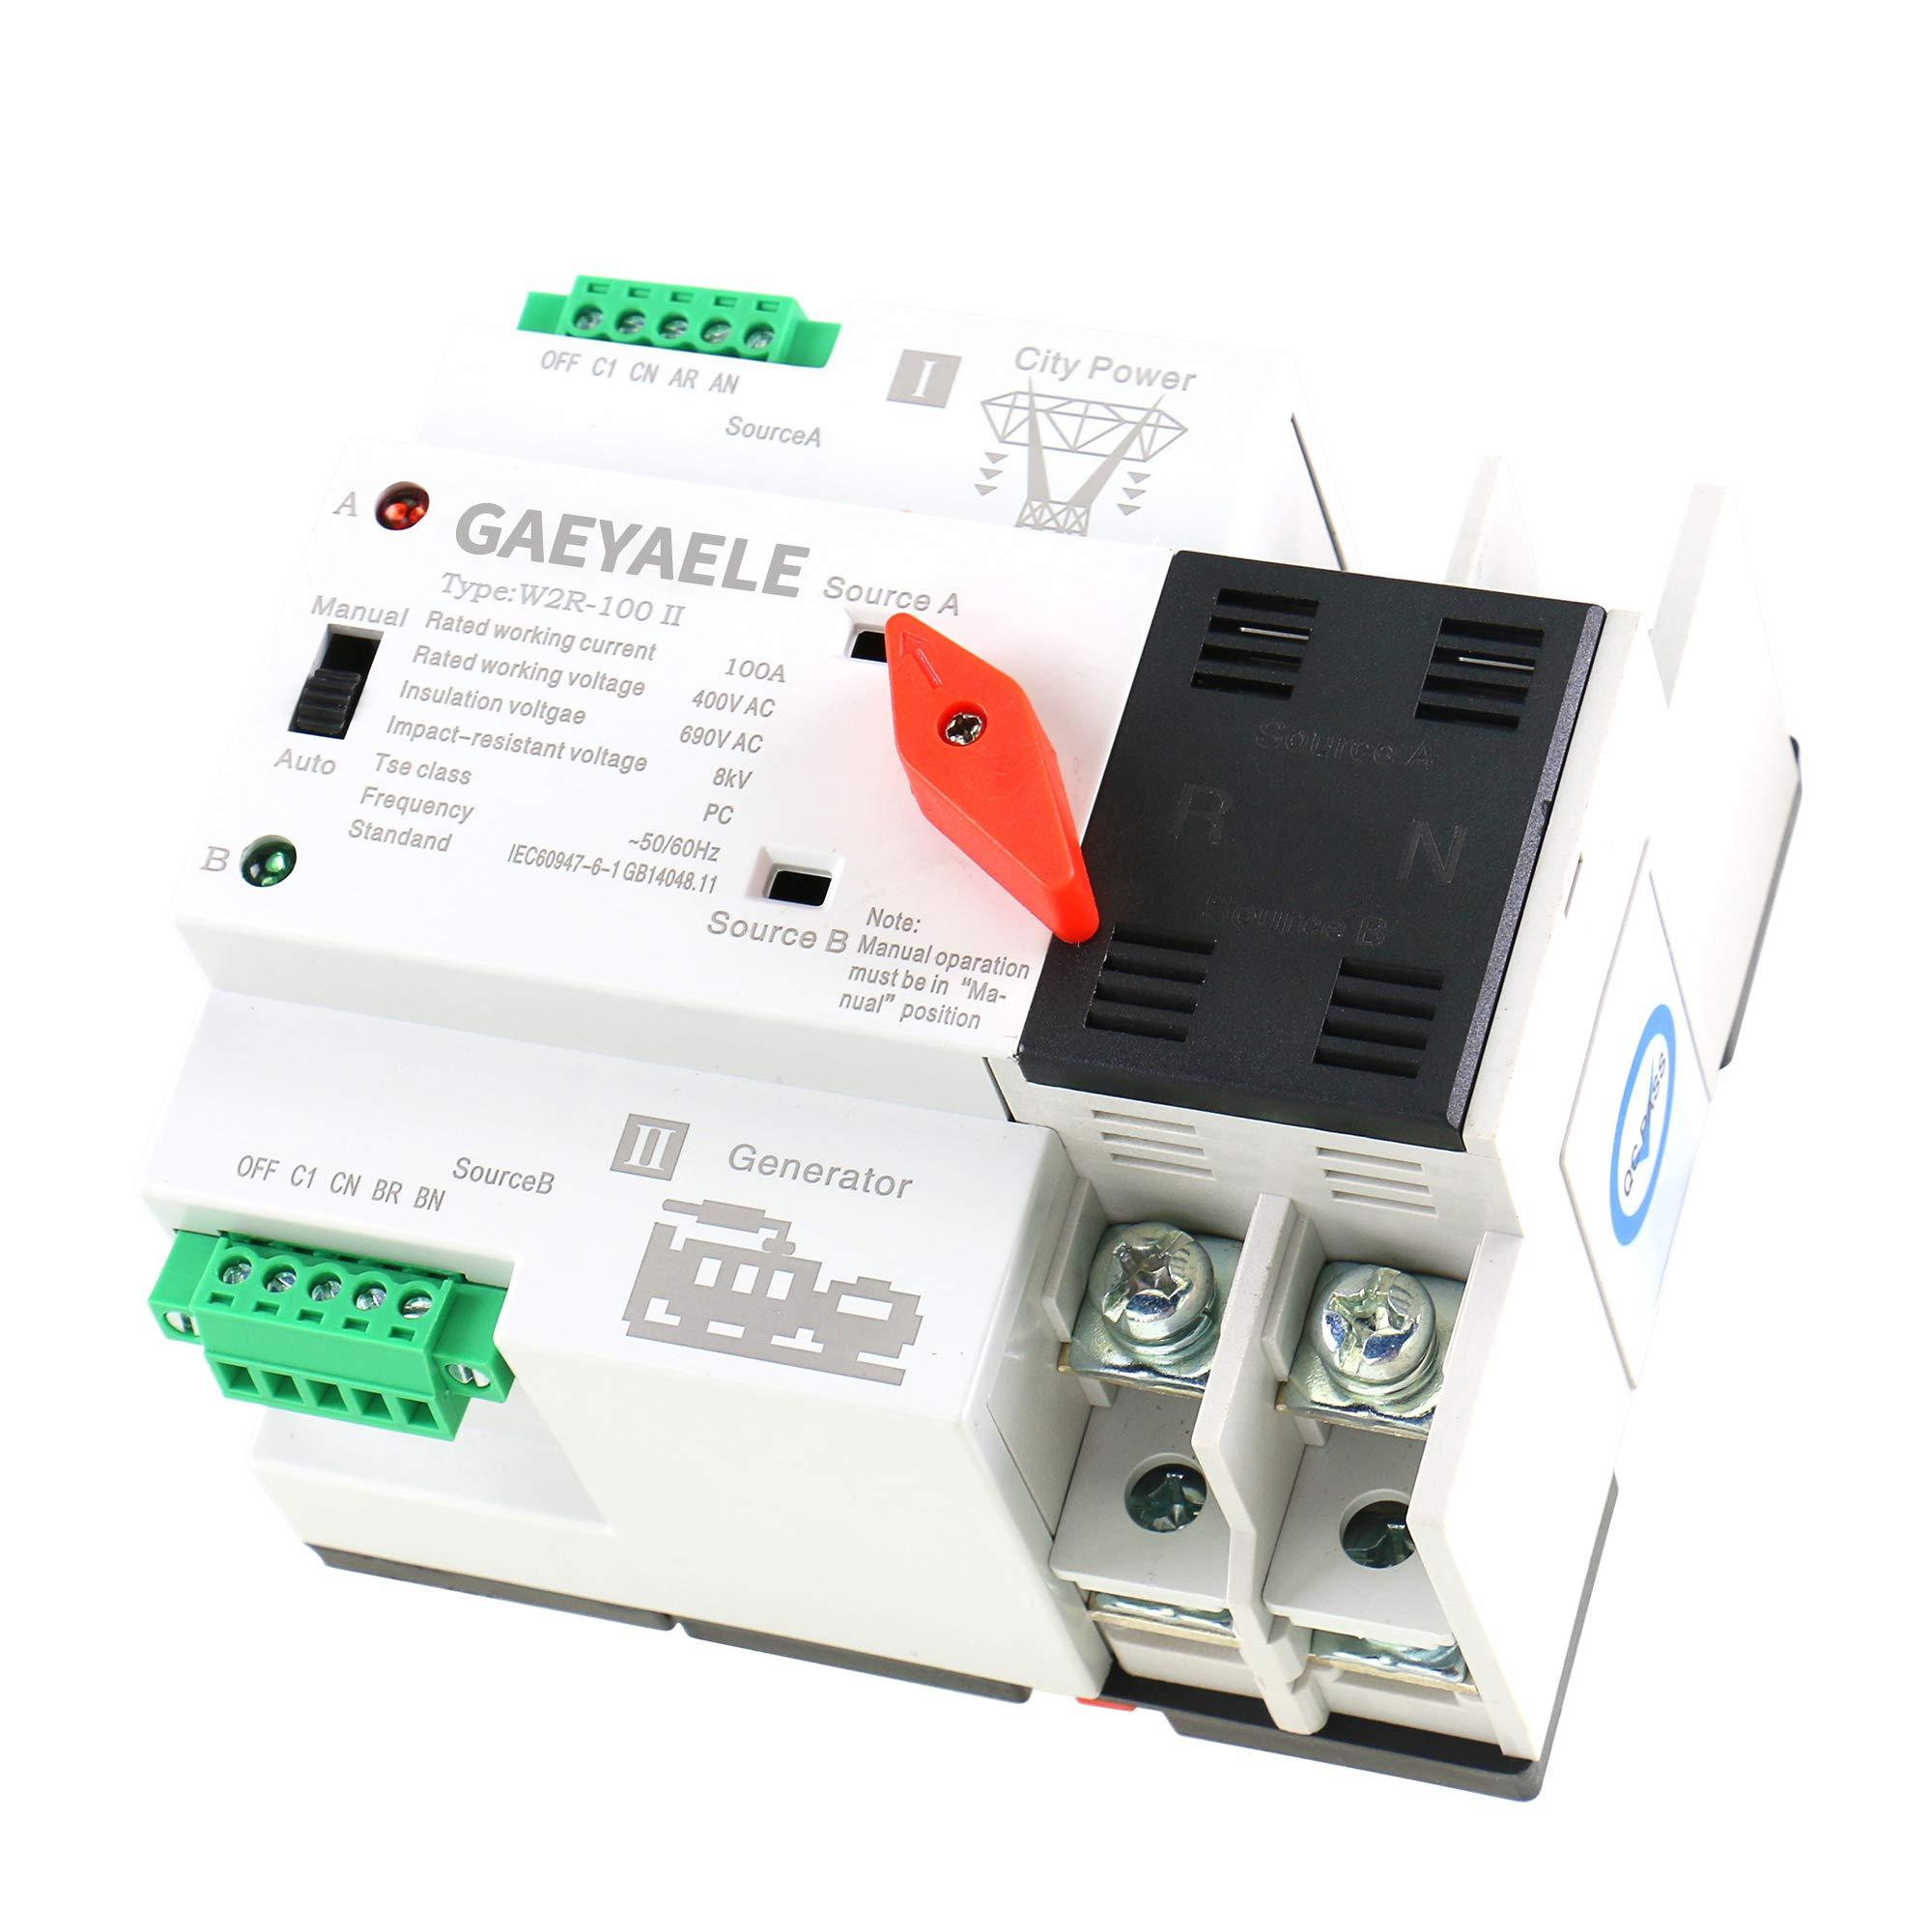 GAEYAELE Automatic Transfer Electrical Selector